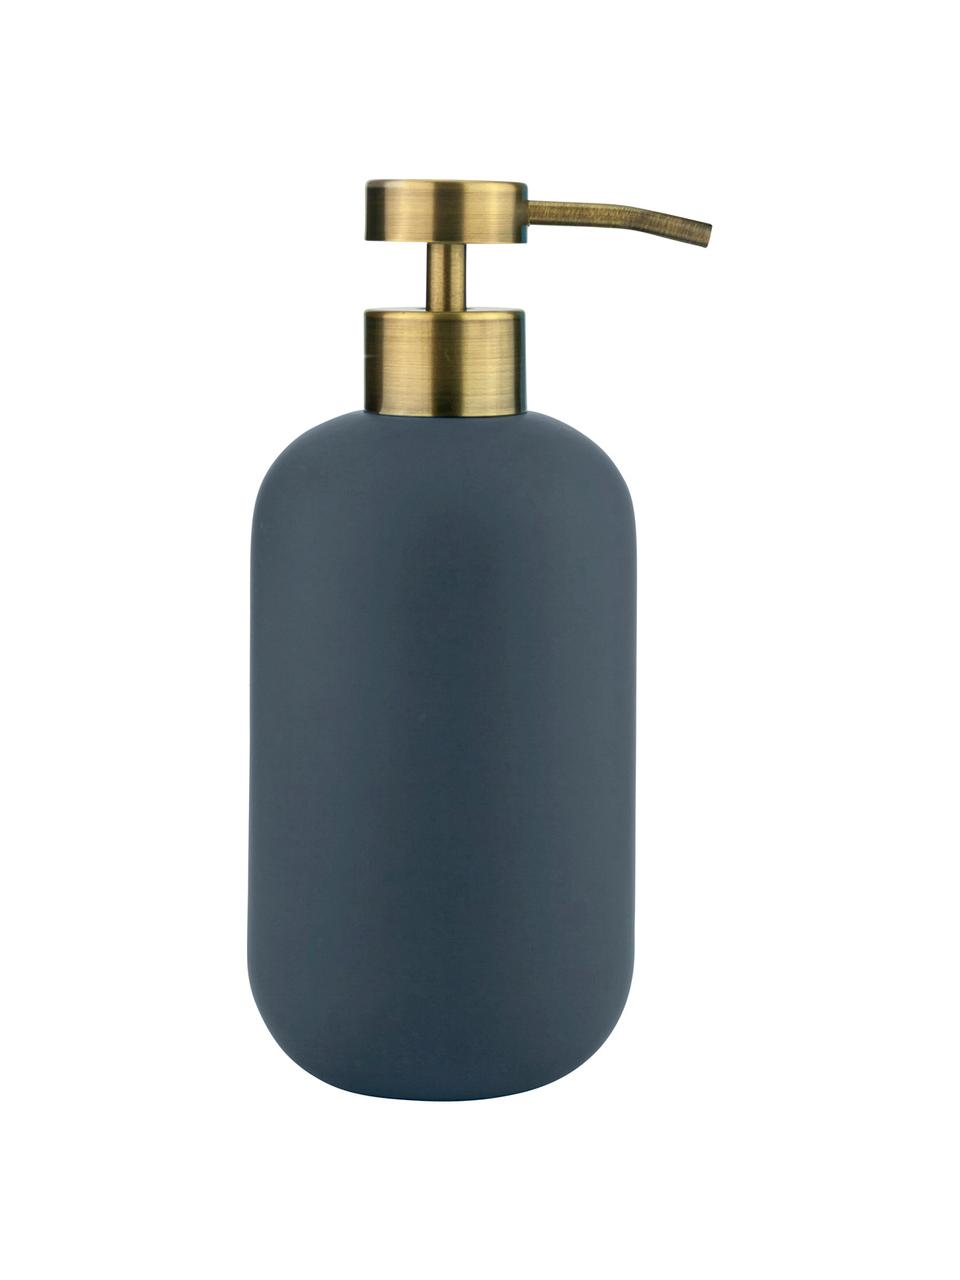 Keramik-Seifenspender Lotus, Behälter: Keramik, Pumpkopf: Metall, beschichtet, Blau, Messingfarben, Ø 8 x H 18 cm